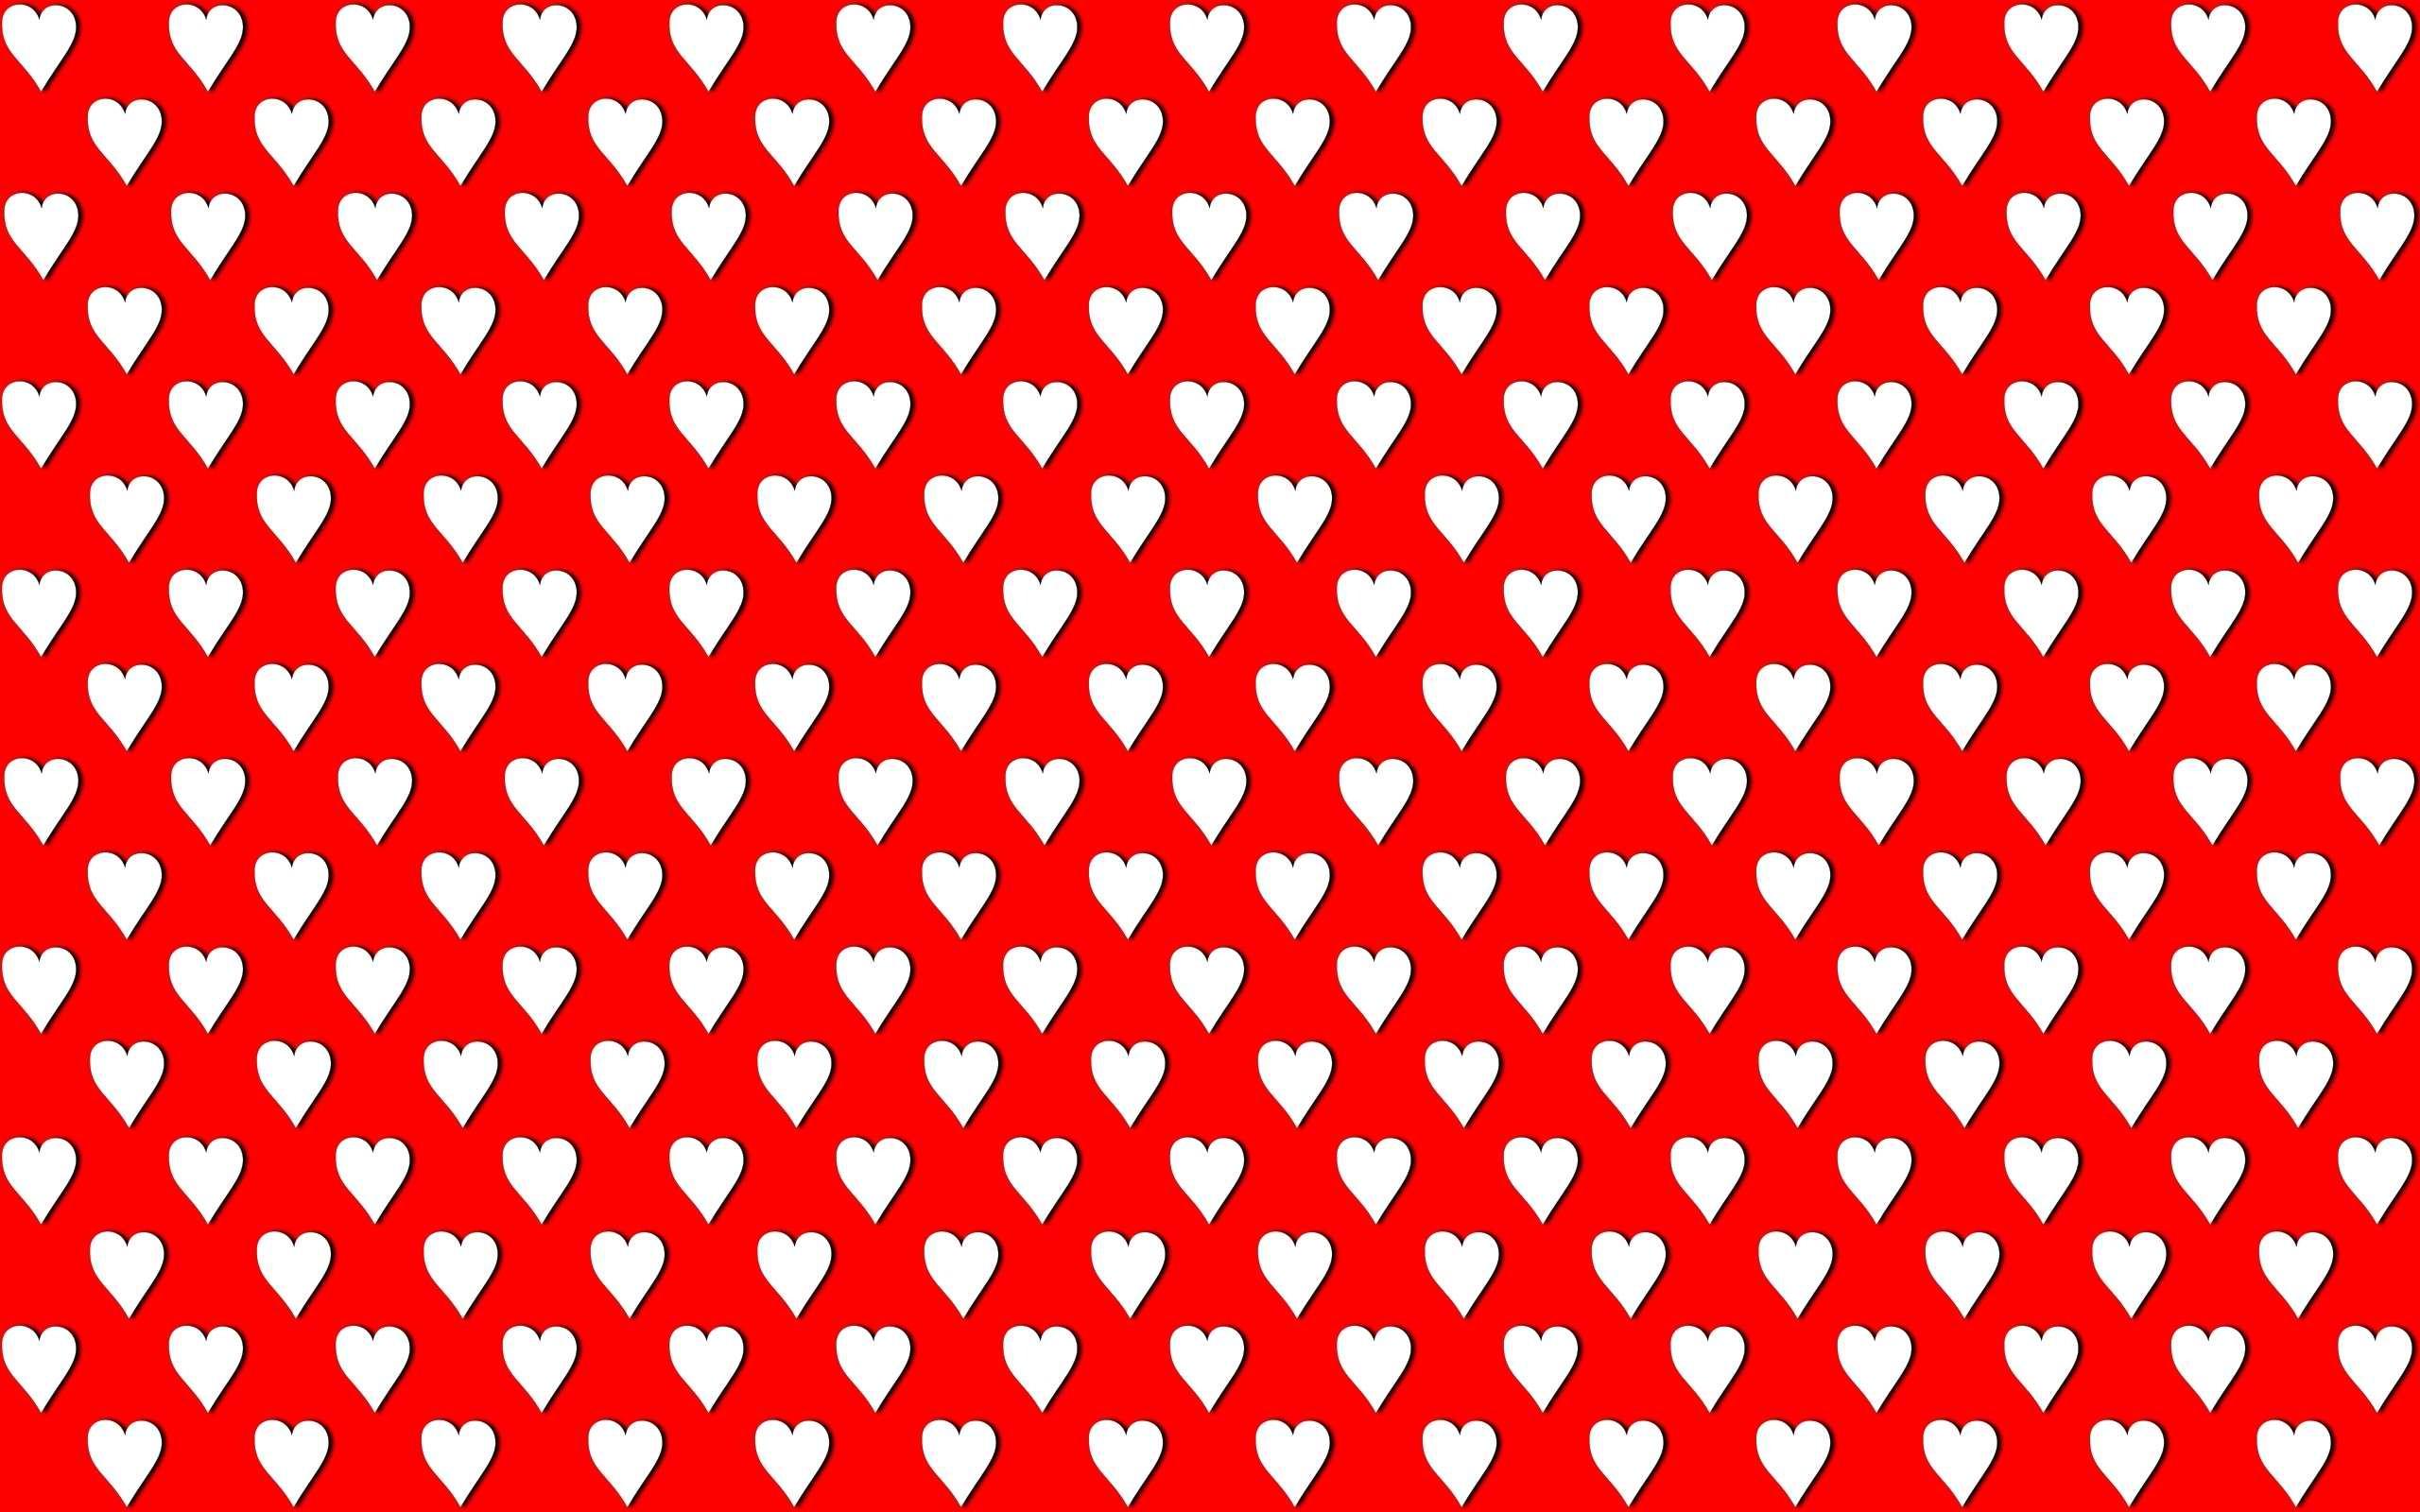 Red Polka Dot Wallpaper – Widescreen HD Wallpapers